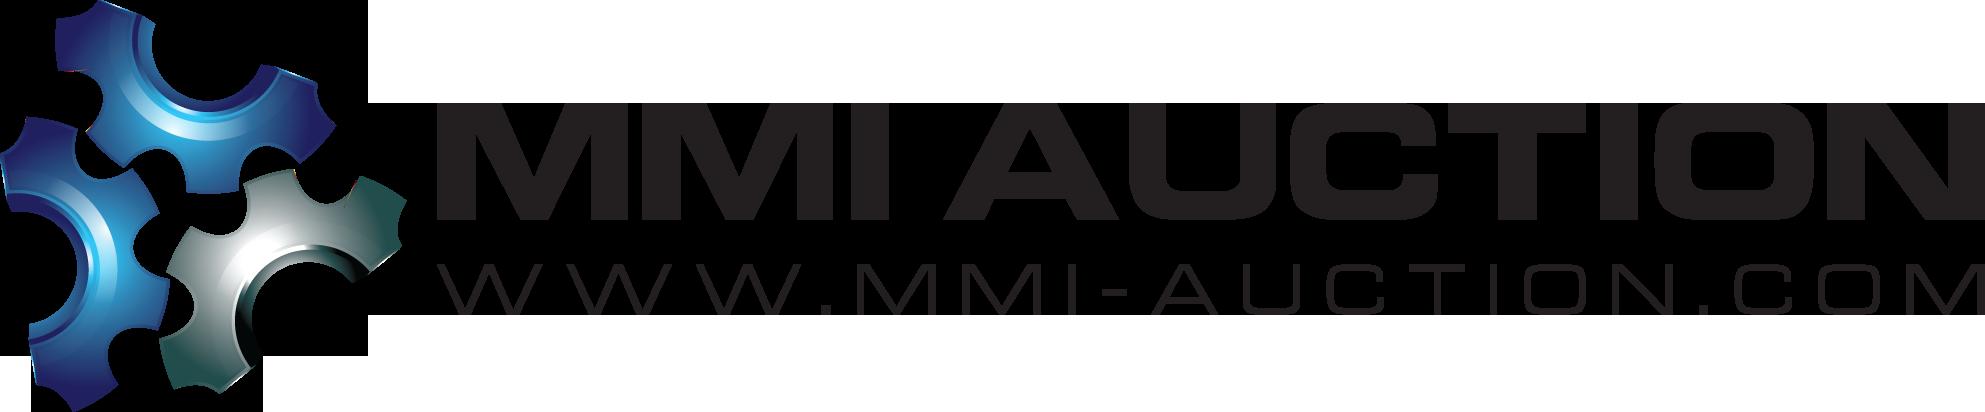 www.mmi-auction.com